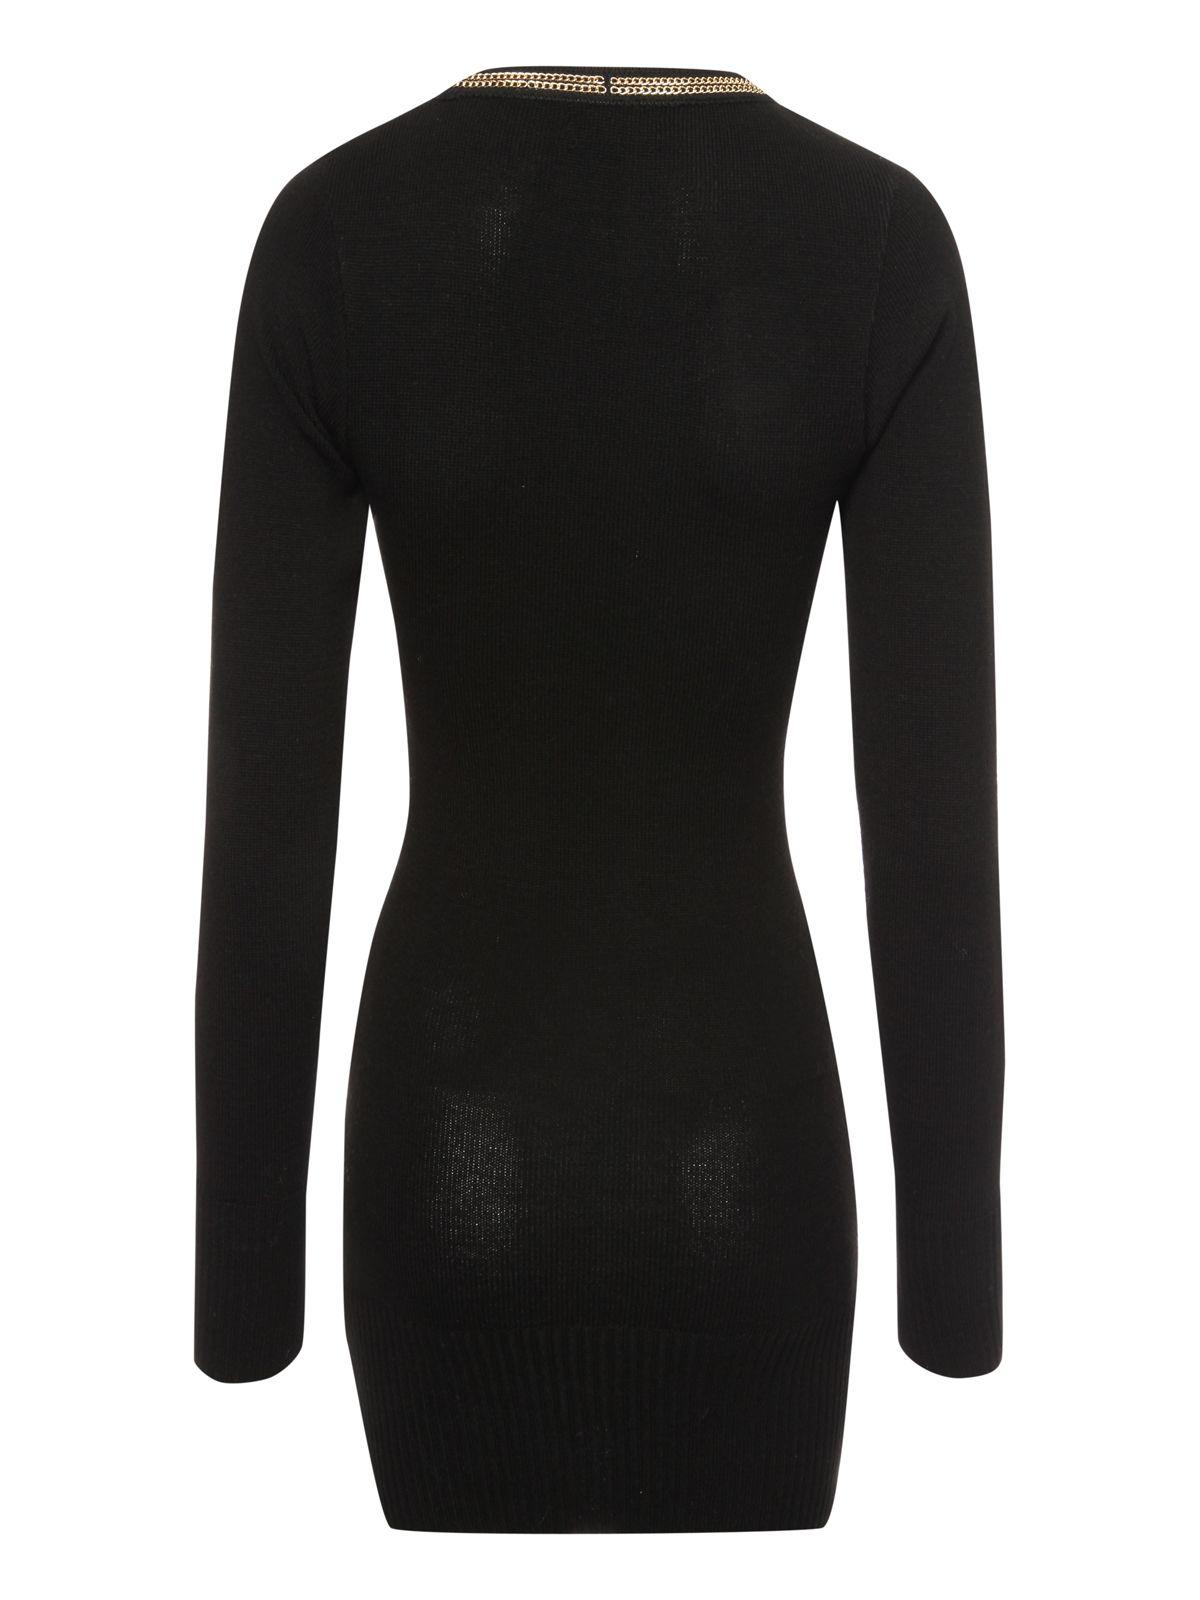 Jane norman Chain Detail Jumper Top in Black